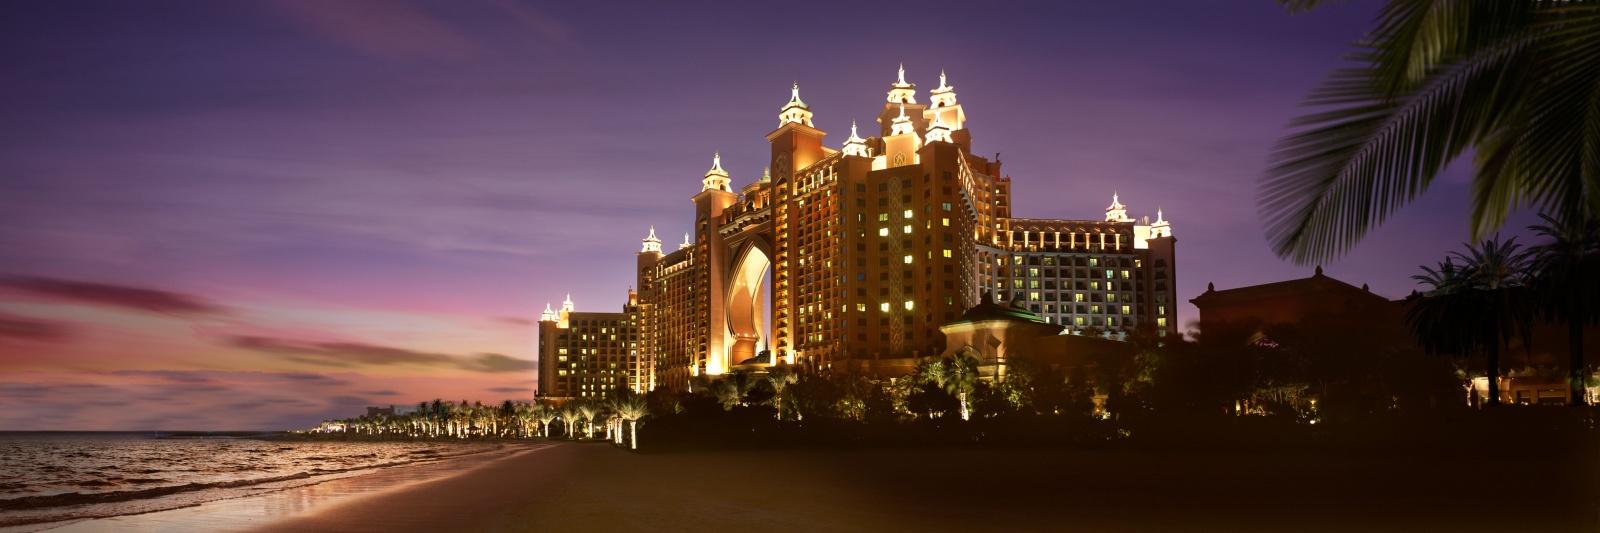 The Palace Of The Lost City >> Atlantis Hotel Dubai